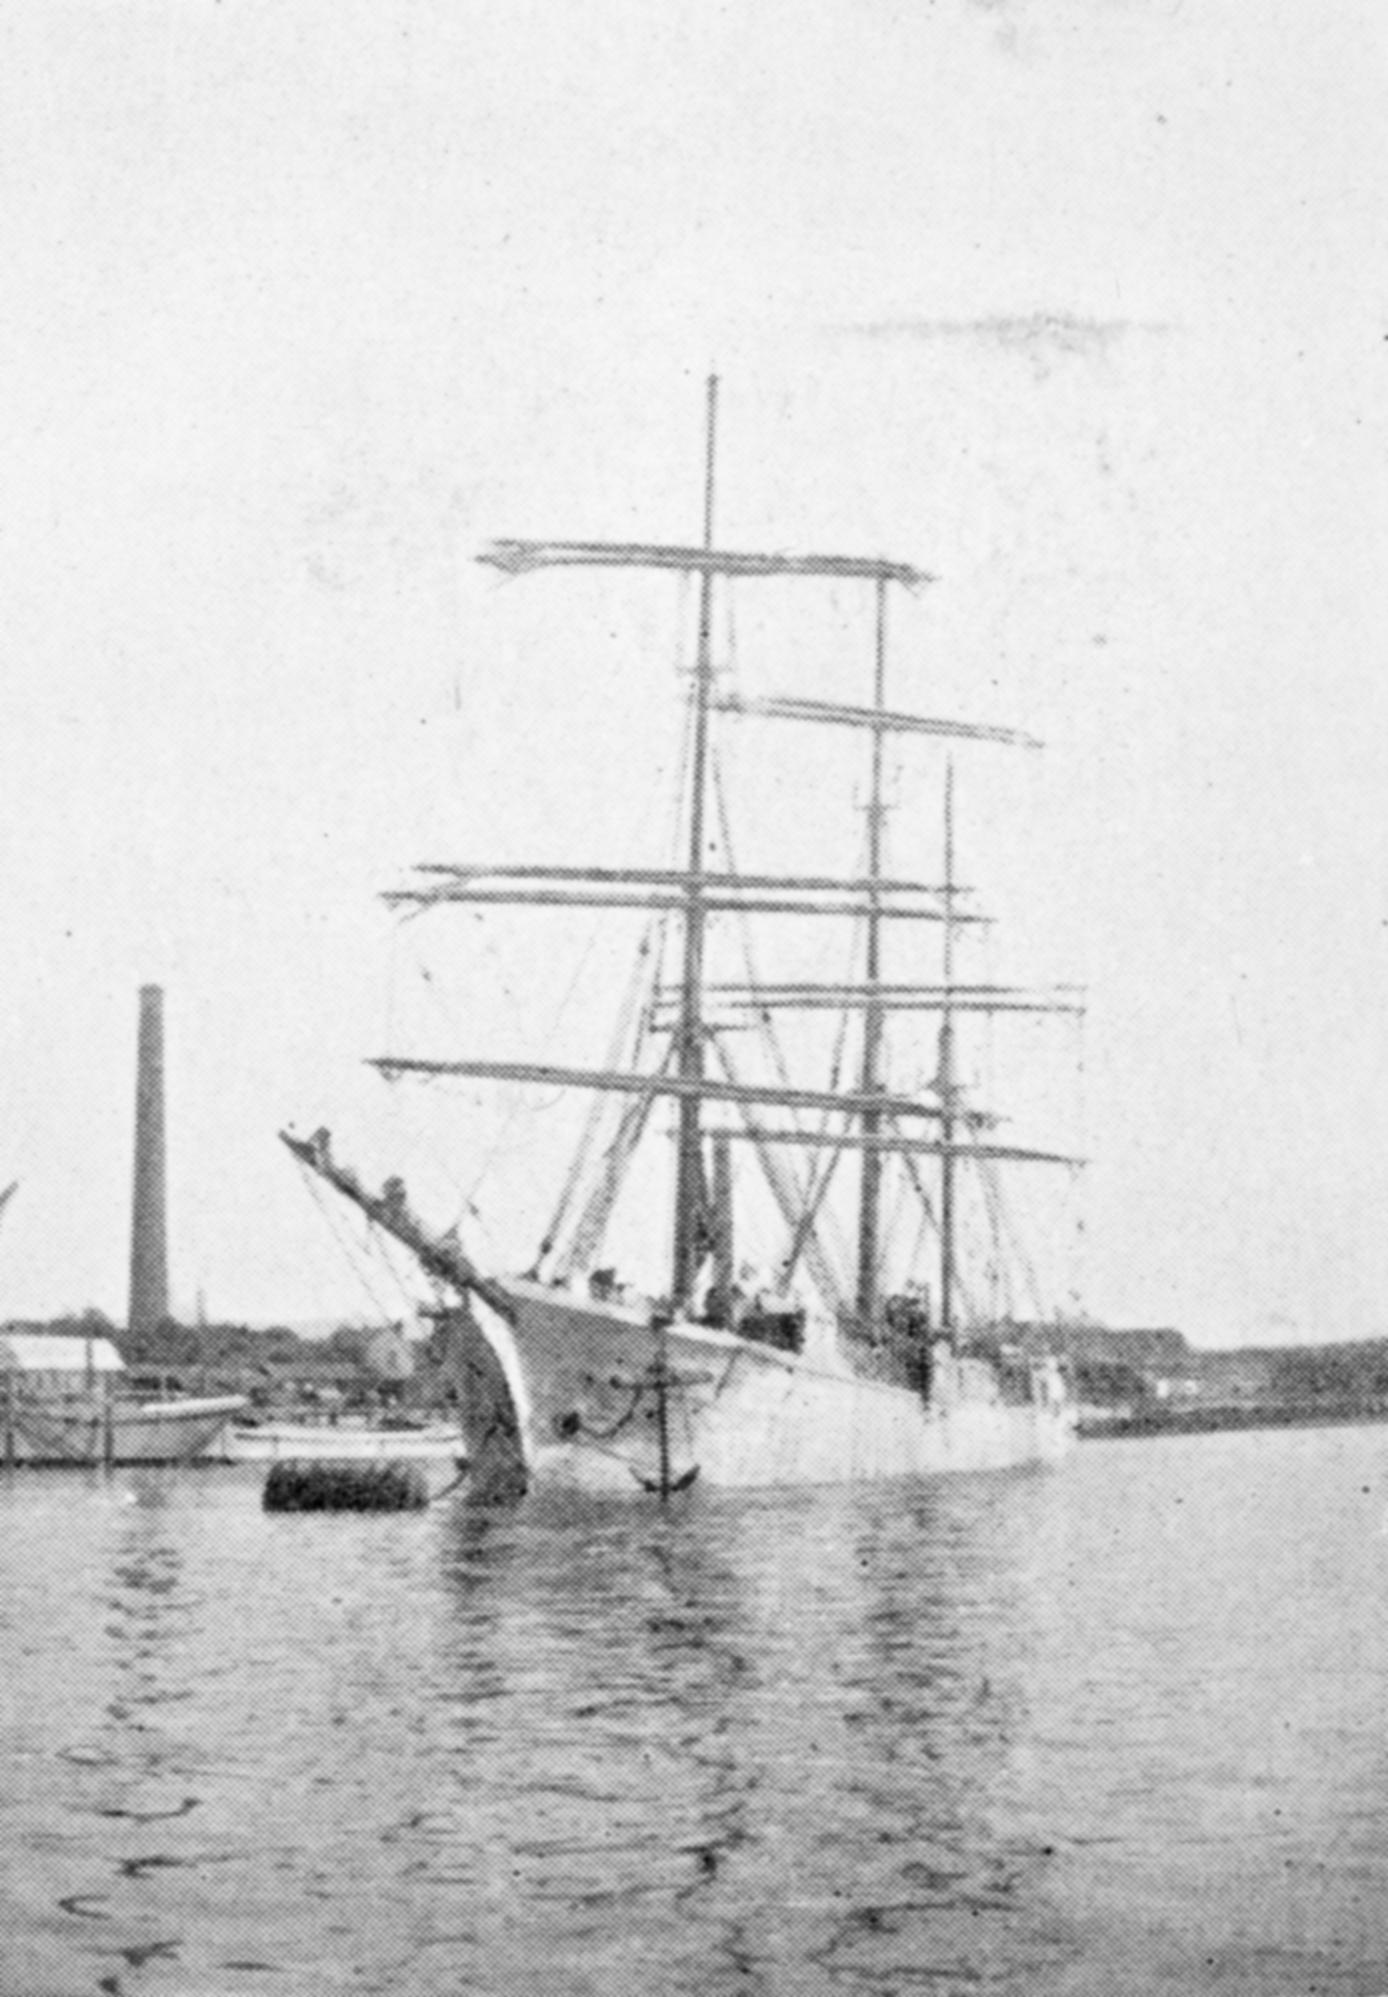 File:Lalla Rookh (ship, 1876) - SLV H99.220-2191A.jpg - Wikimedia ...